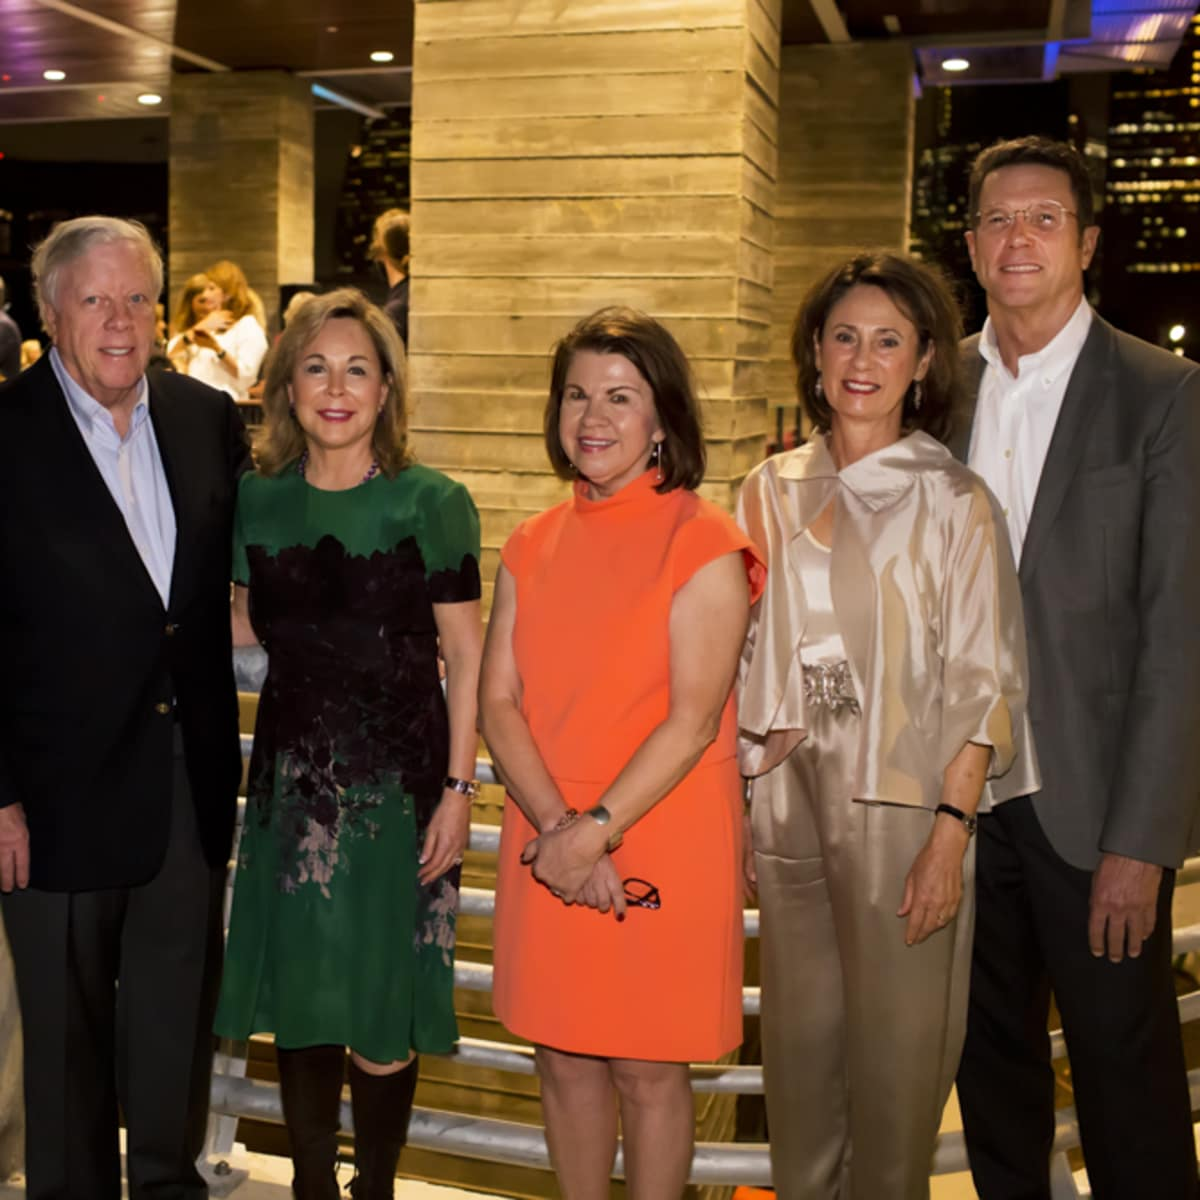 News, Shelby, Buffalo Bayou Partnership gala, Nov. 2015, Collin Cox, Rich Kinder, Nancy Kinder, Anne Olson, Sis Johnson, and Guy